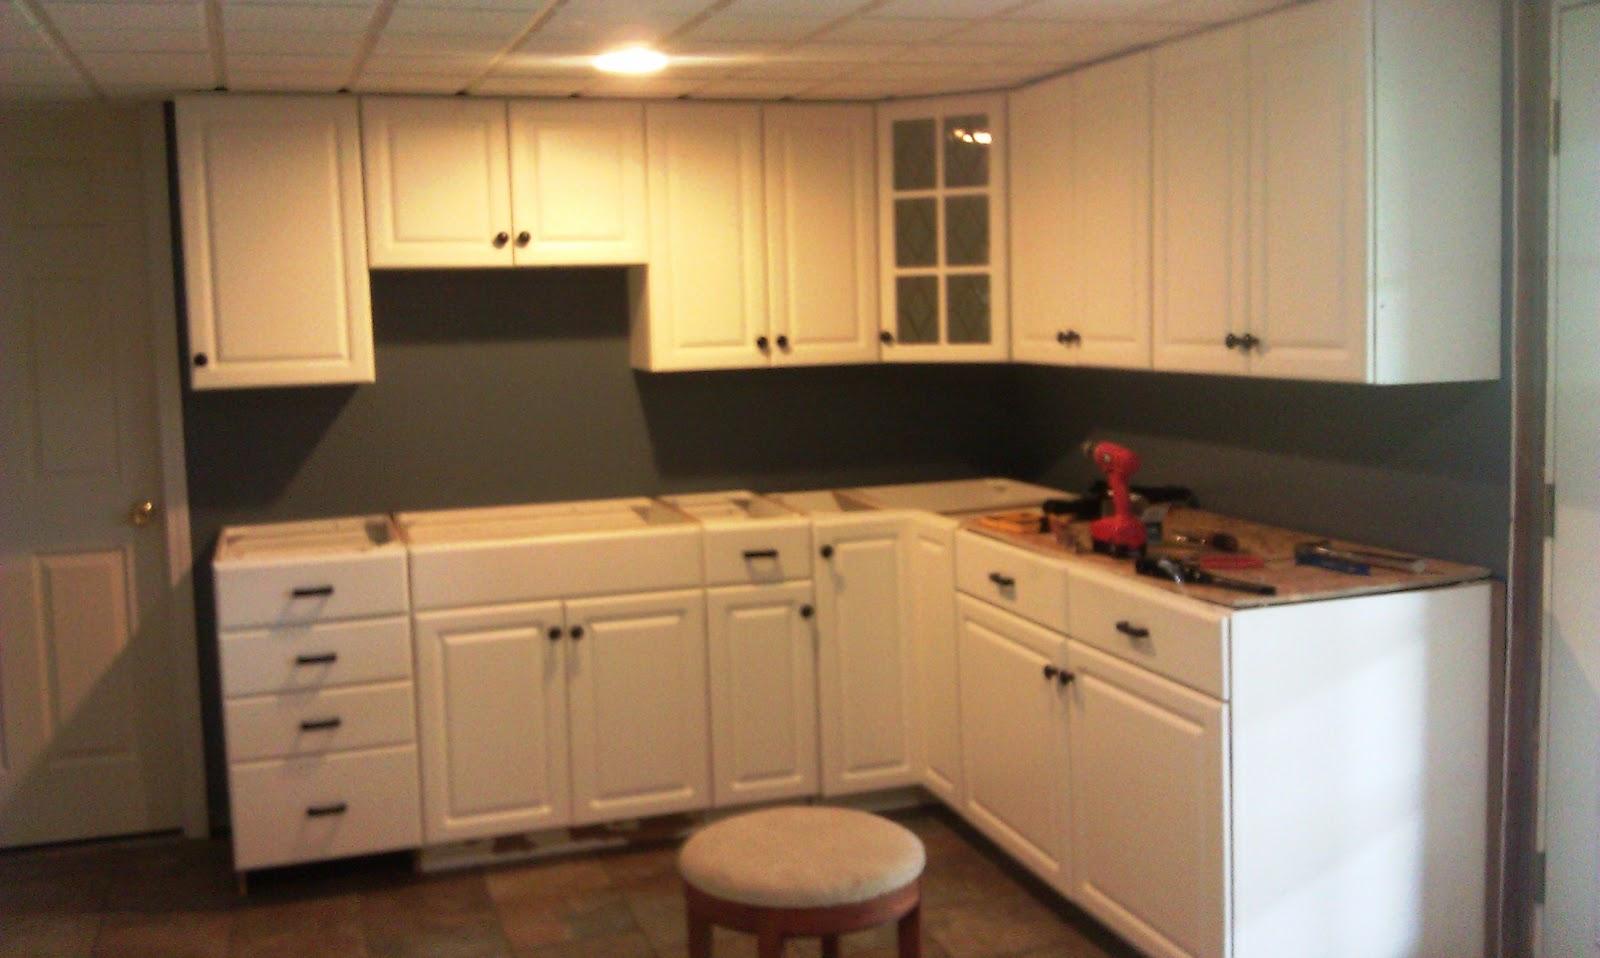 home improvement mom and wife slate backsplash with white cabinets slate backsplash with white cabinets